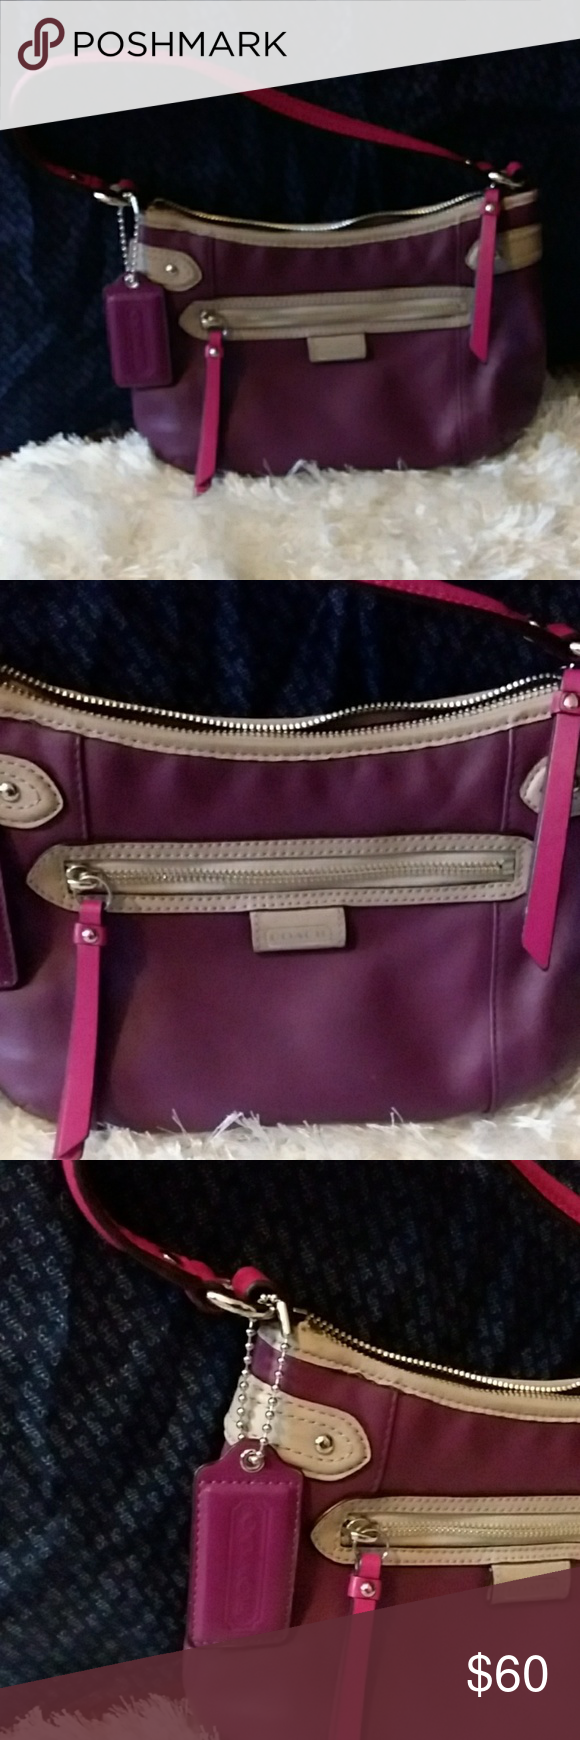 Pink Wento 1pcs 31-57 Webbing Shoulder Cross Pink Bag Strap,Band width 0.78,replacement Cross Body Purse Straps,Pink canvas purses straps WTD33